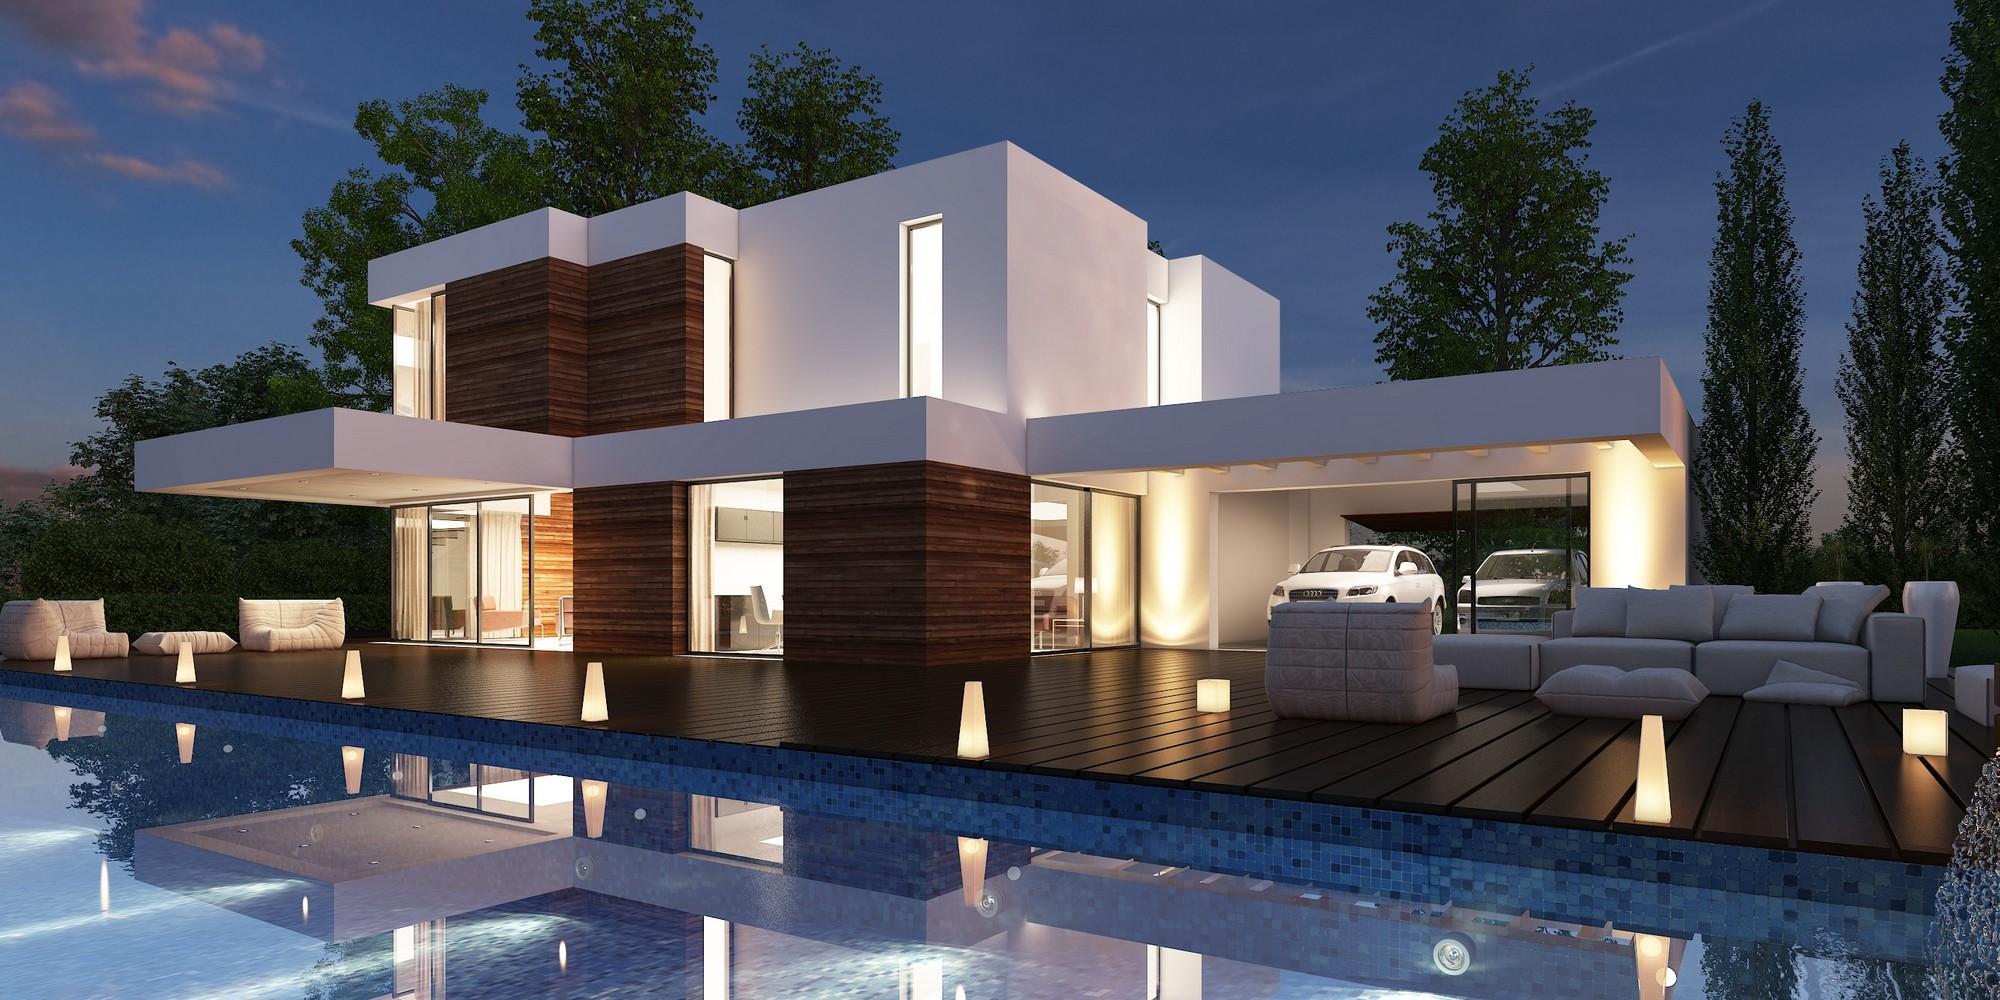 132 casas bonitas modernas fotos lindas for Viviendas de campo modernas